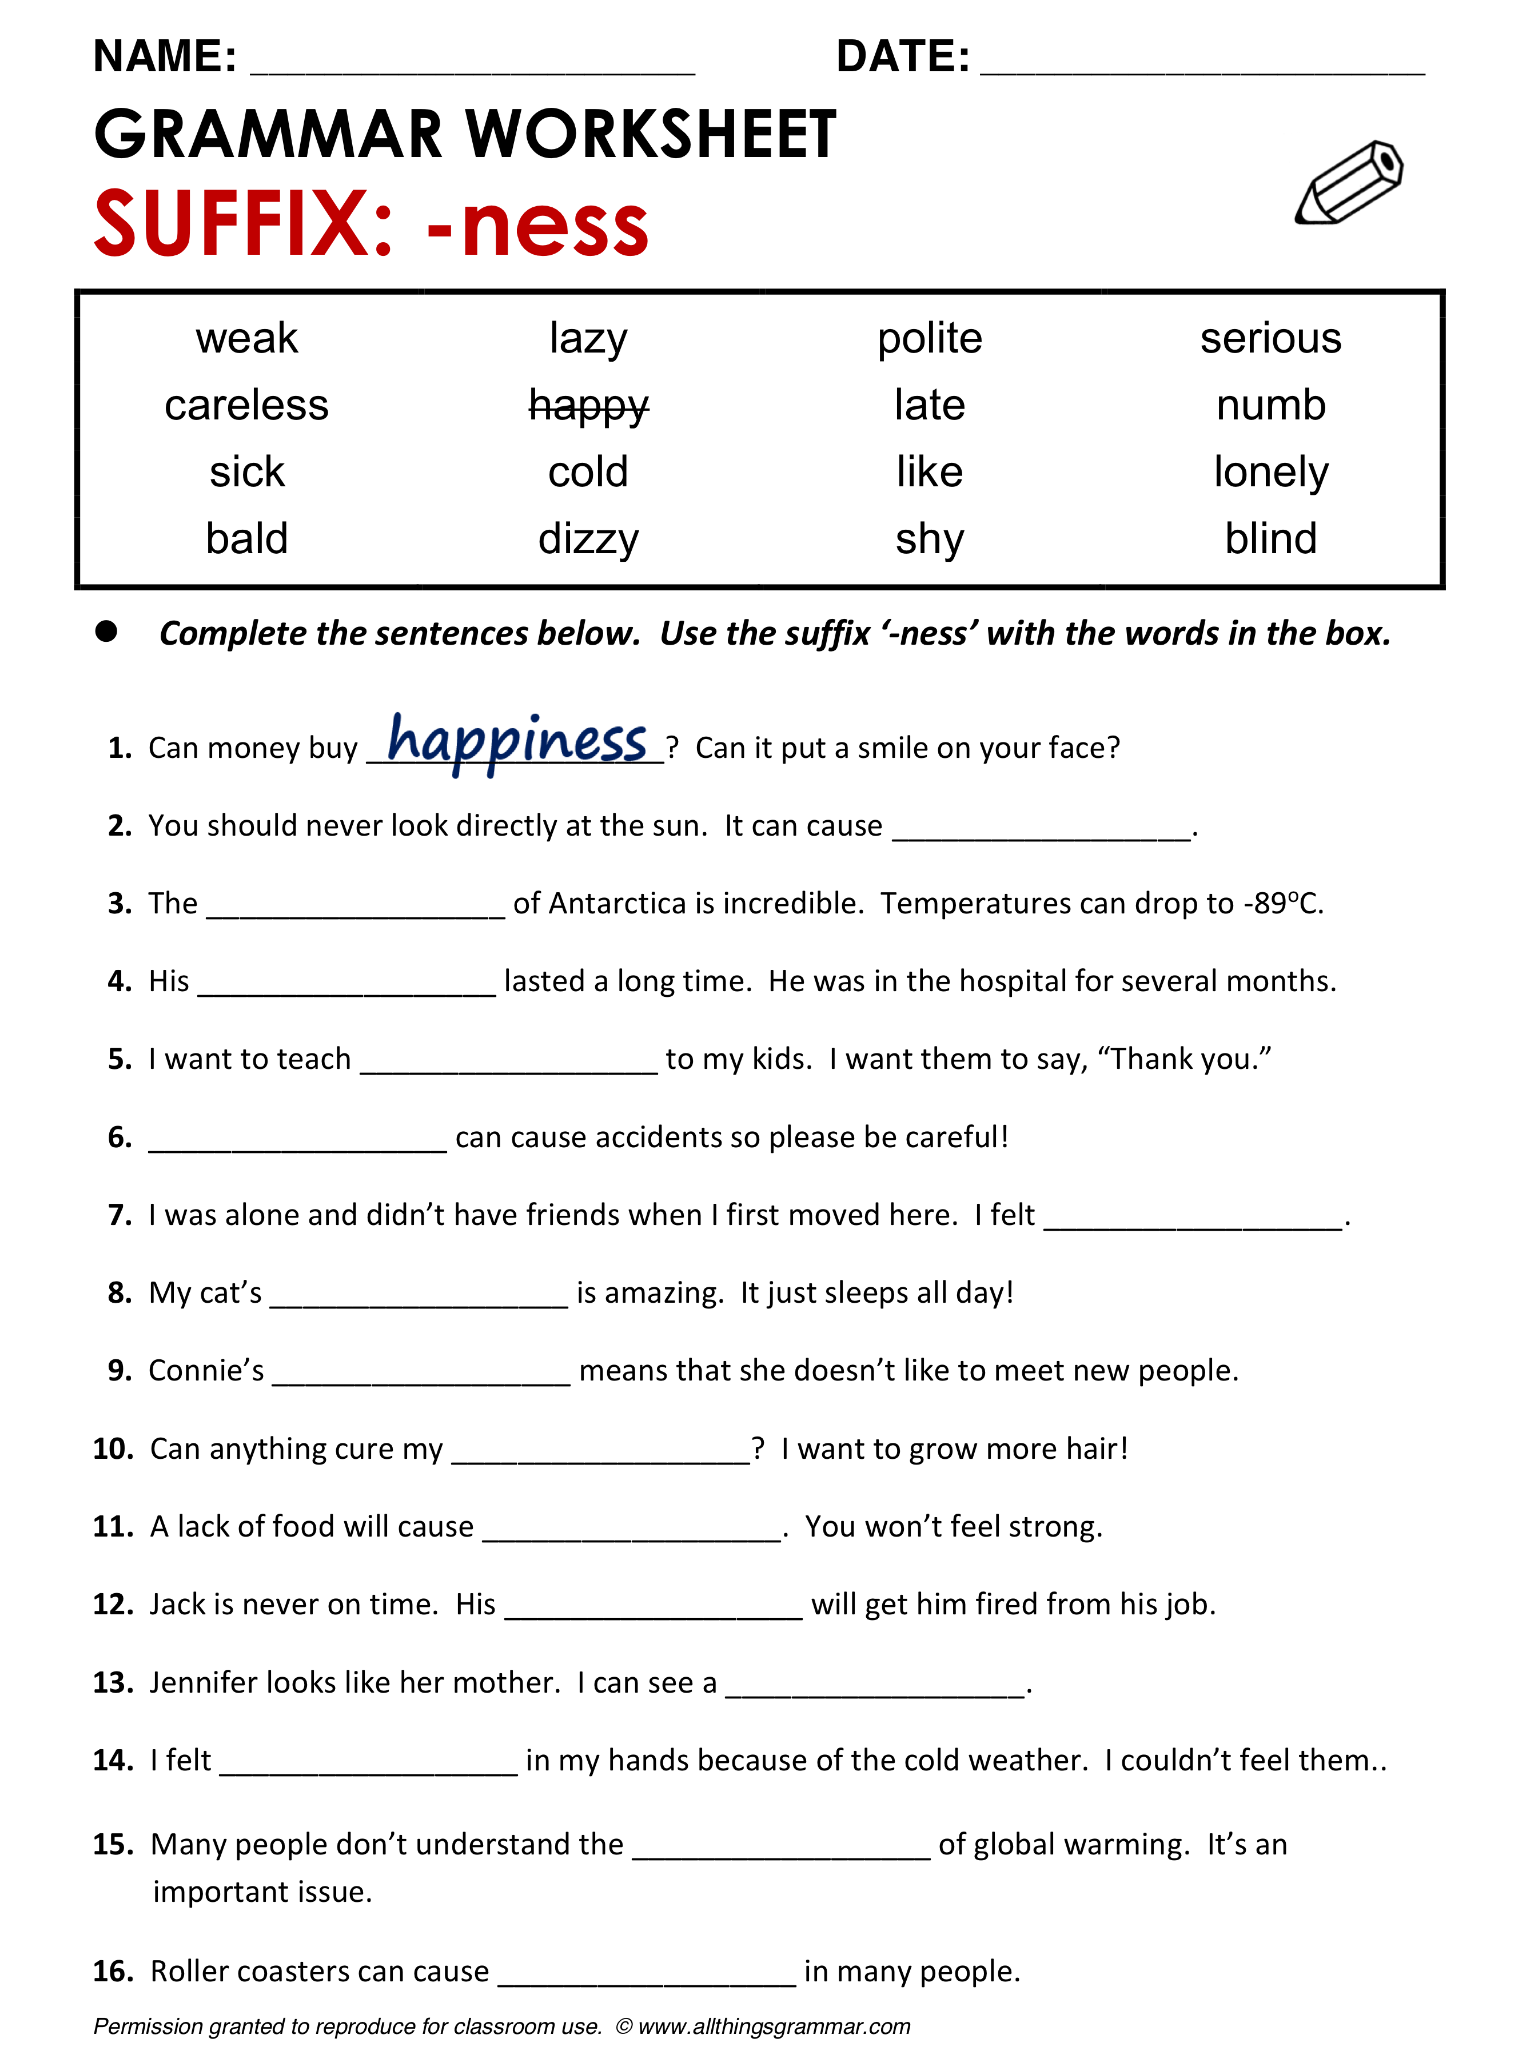 hight resolution of English Grammar Suffix: -ness www.allthingsgrammar.com/suffix--ness.html    English grammar worksheets